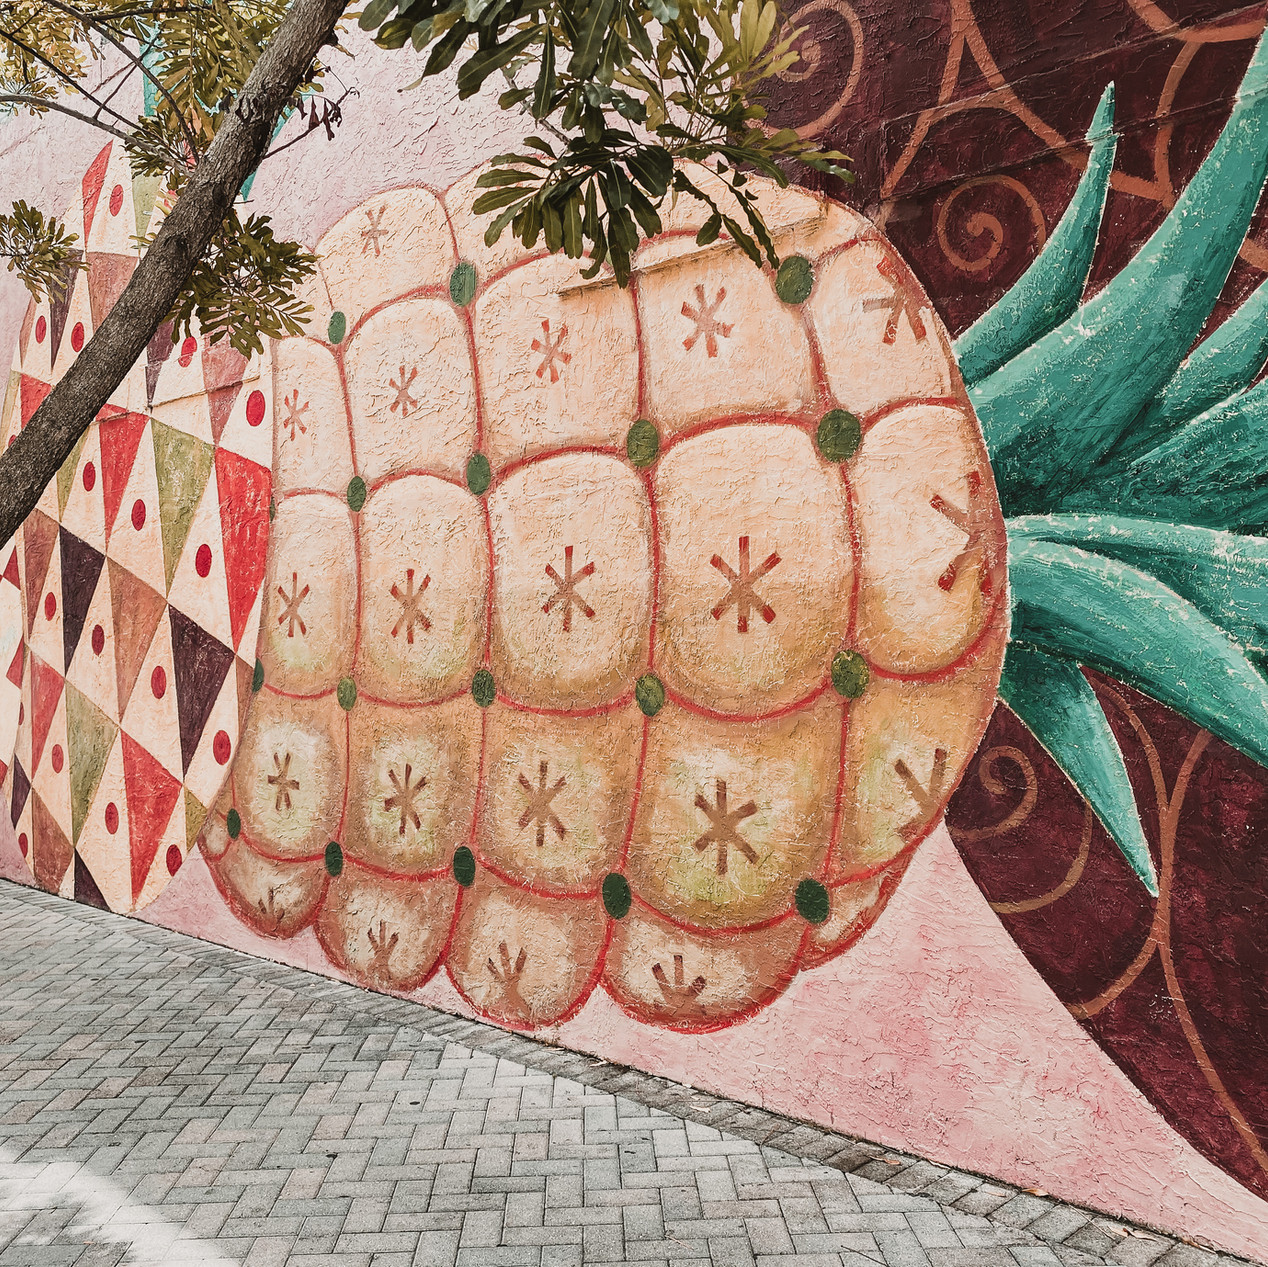 Pineapple Grove Arts District